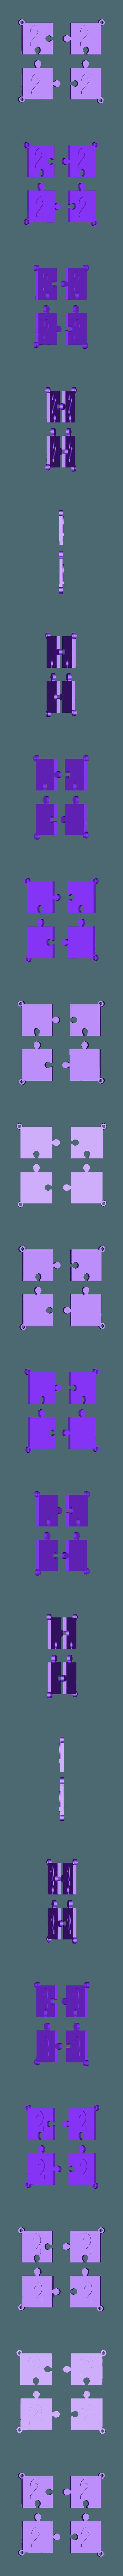 puzzle 2.stl Download STL file puzzle key ring • 3D printing design, catf3d